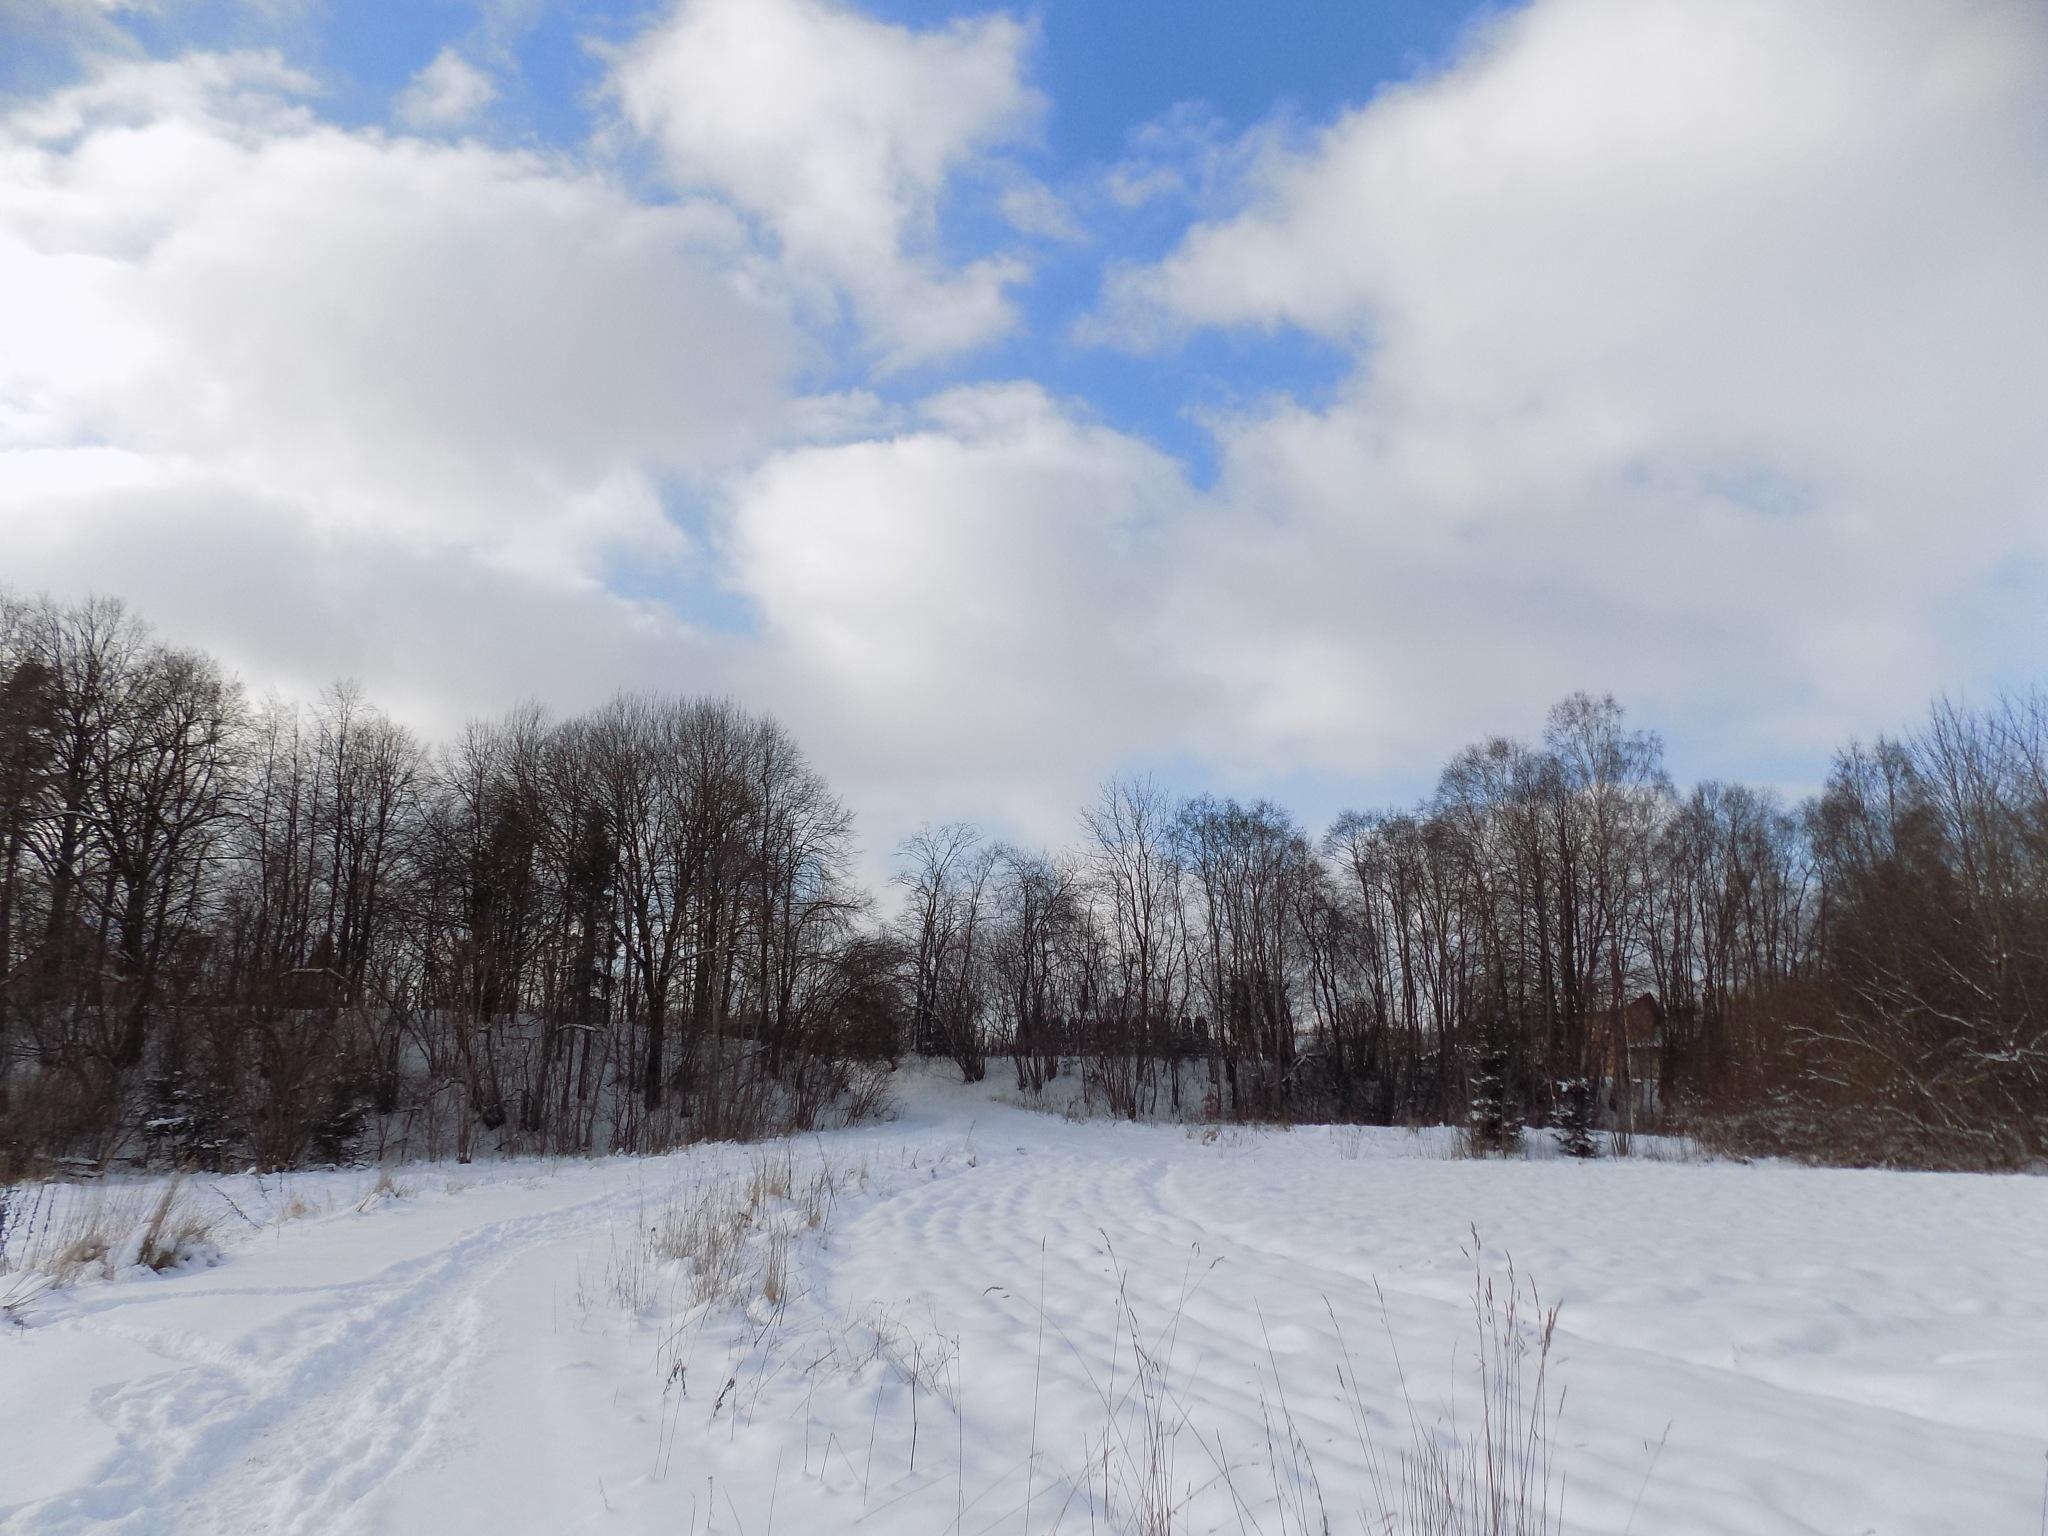 Landscape in winter by uzkuraitiene62